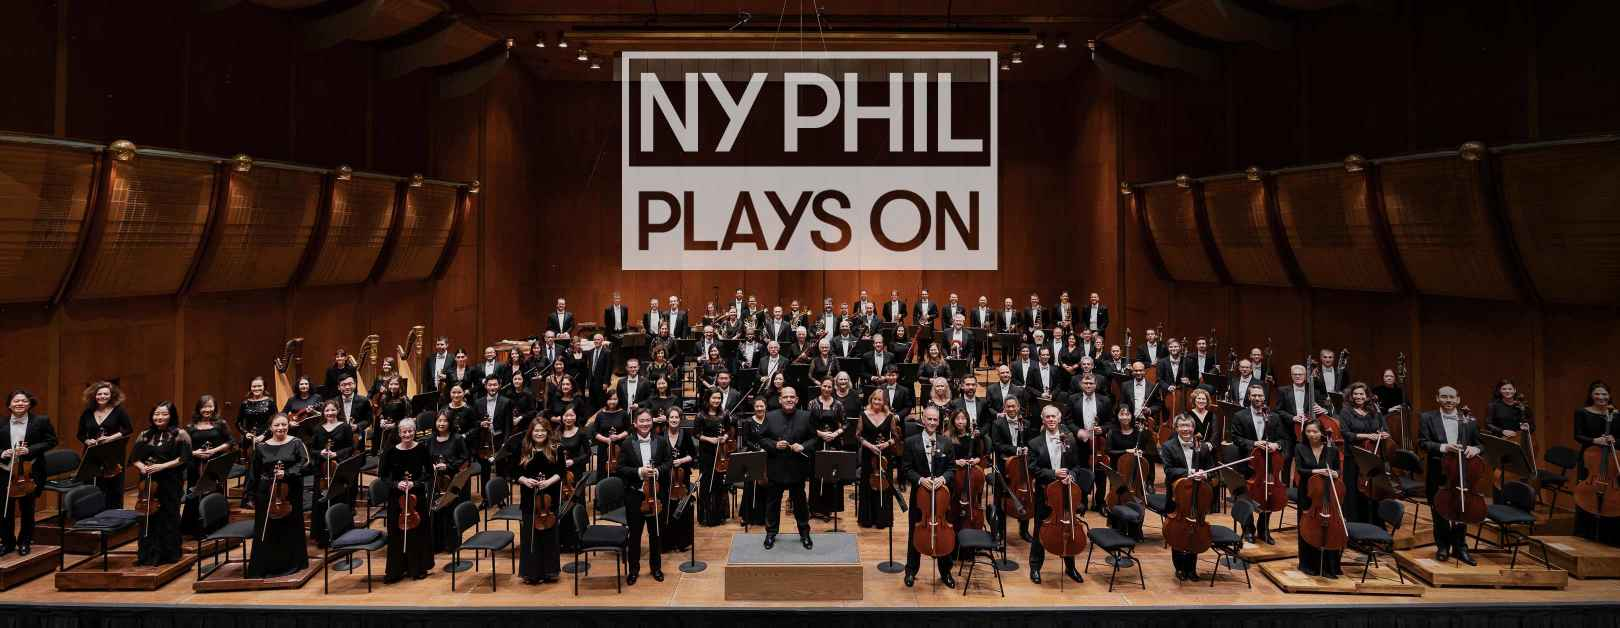 NY Phil Plays On